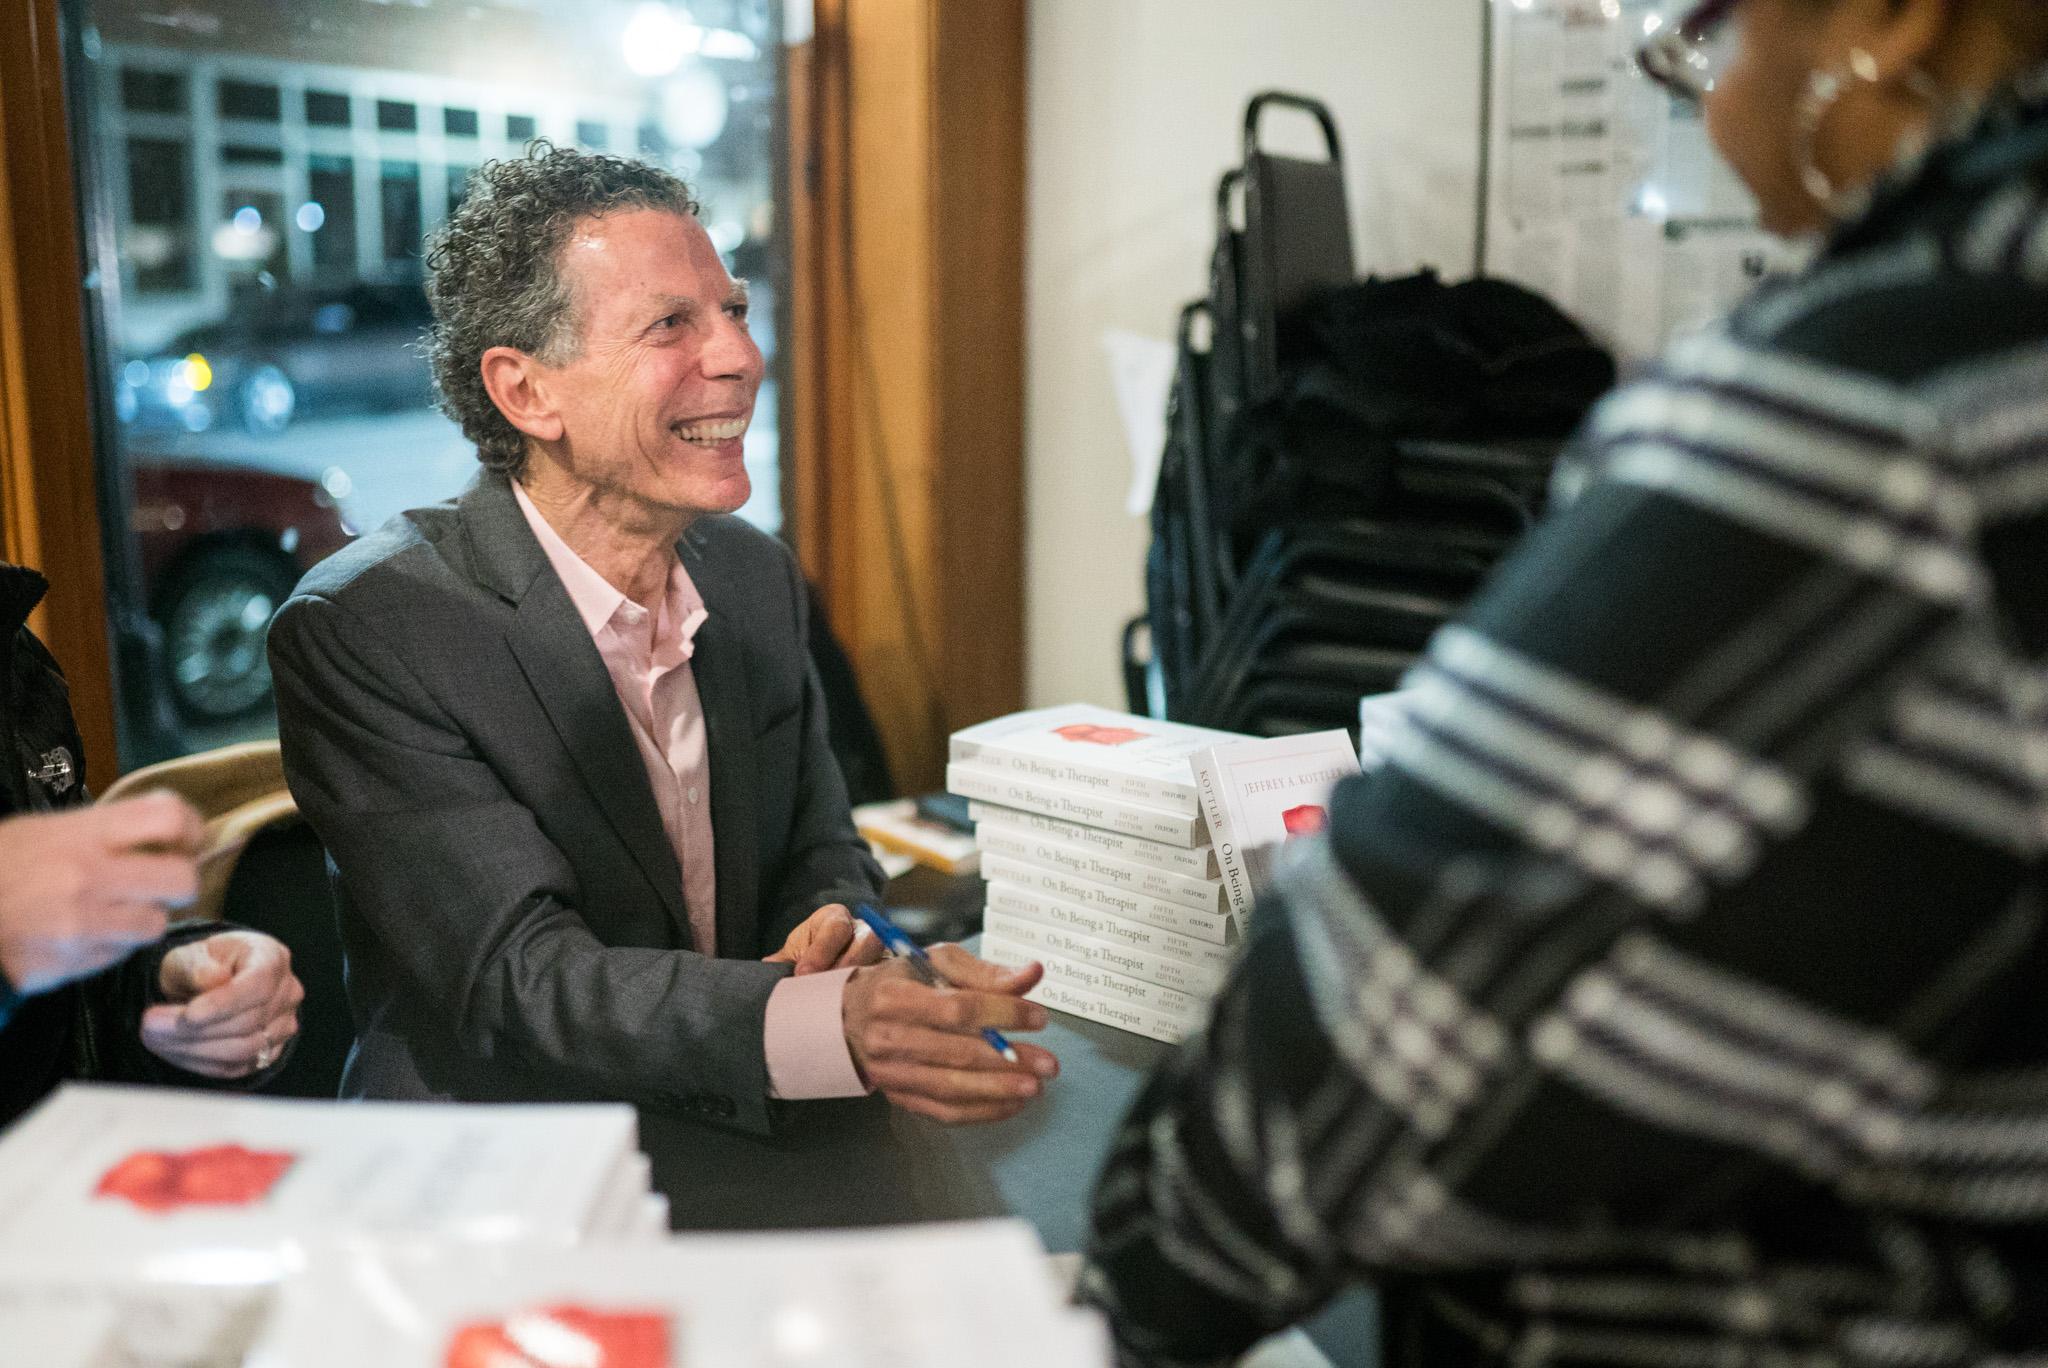 jeffrey kottler signing books